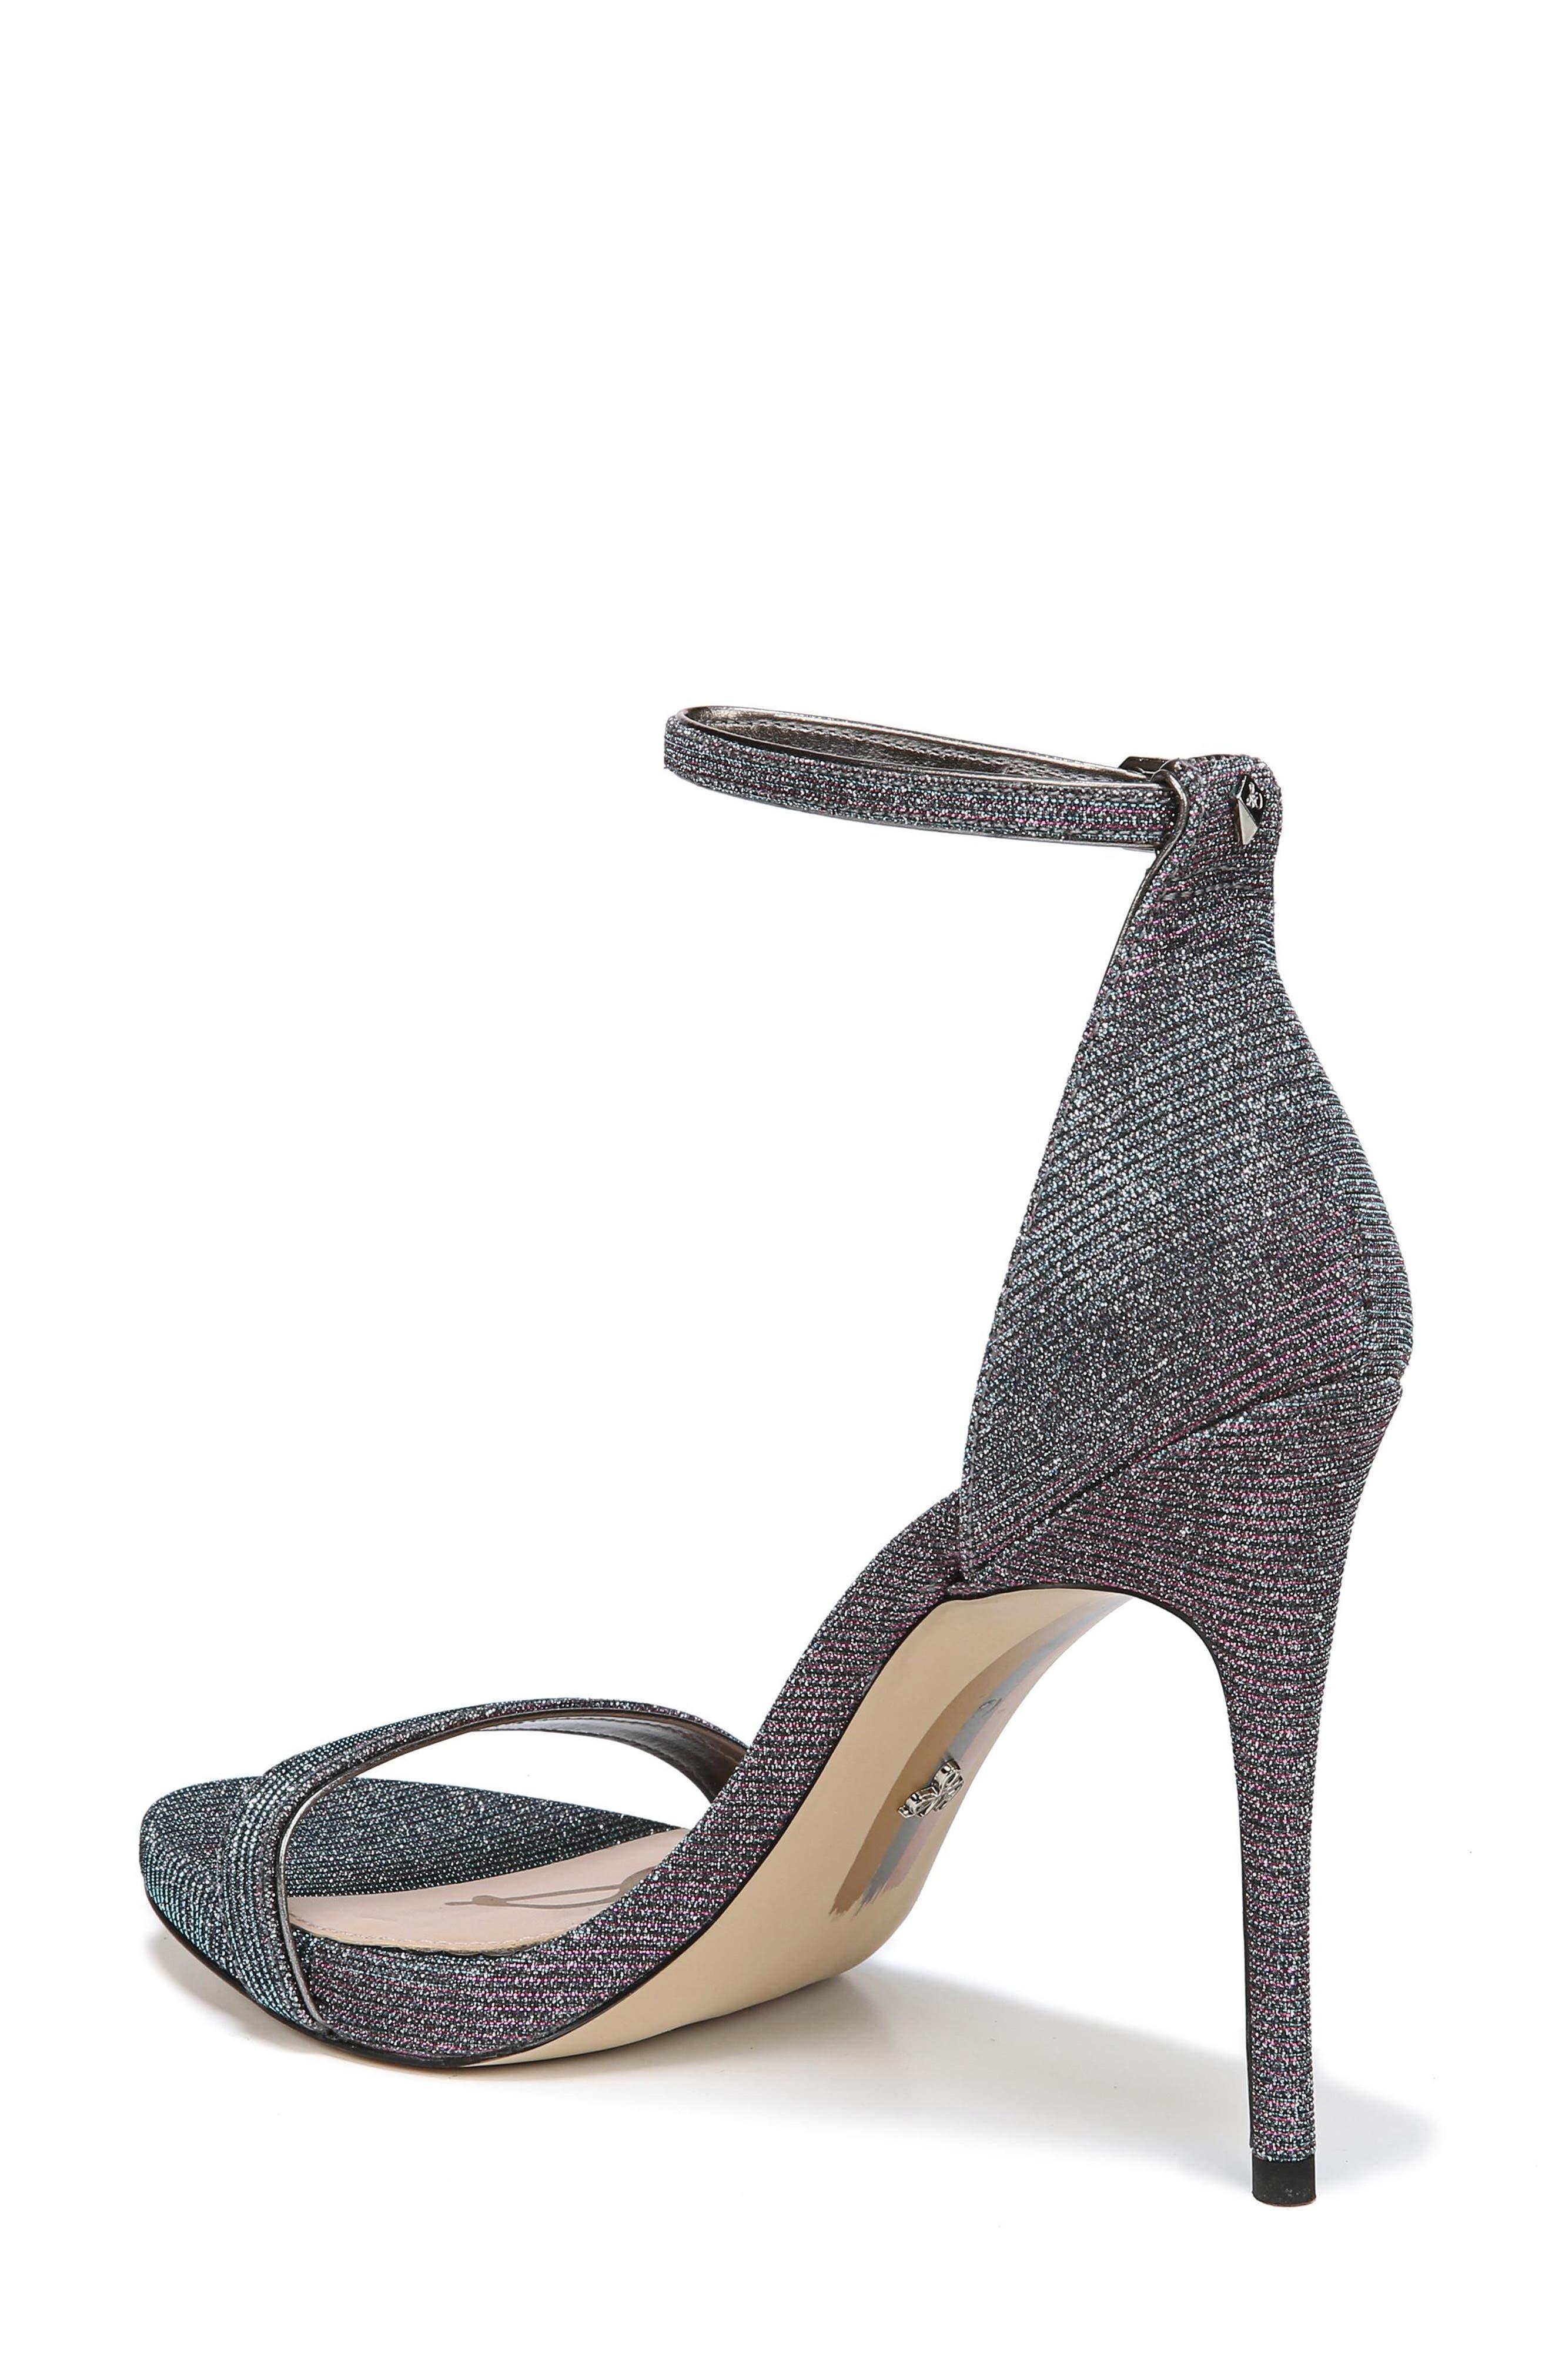 Ariella Ankle Strap Sandal,                             Alternate thumbnail 2, color,                             Pink/ Blue Multi Fabric